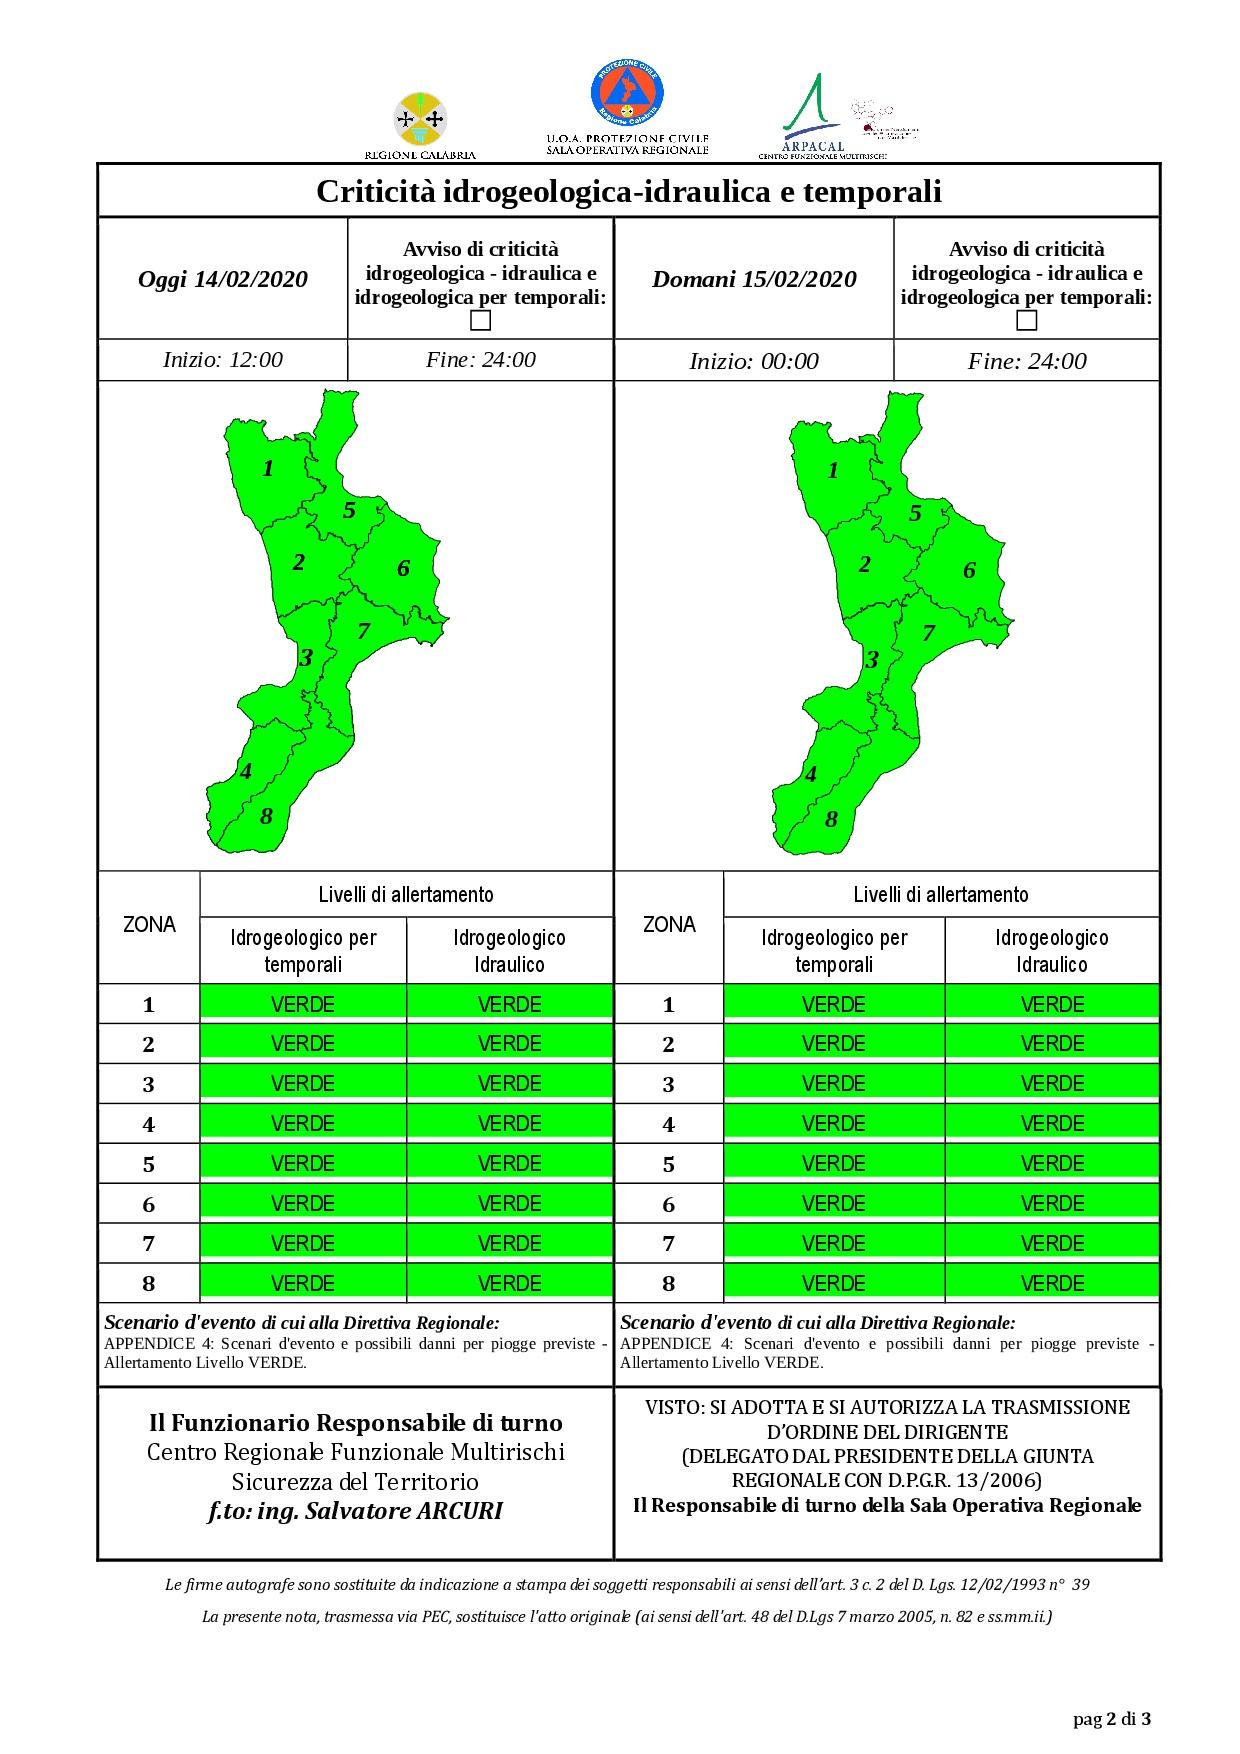 Criticità idrogeologica-idraulica e temporali in Calabria 14-02-2020